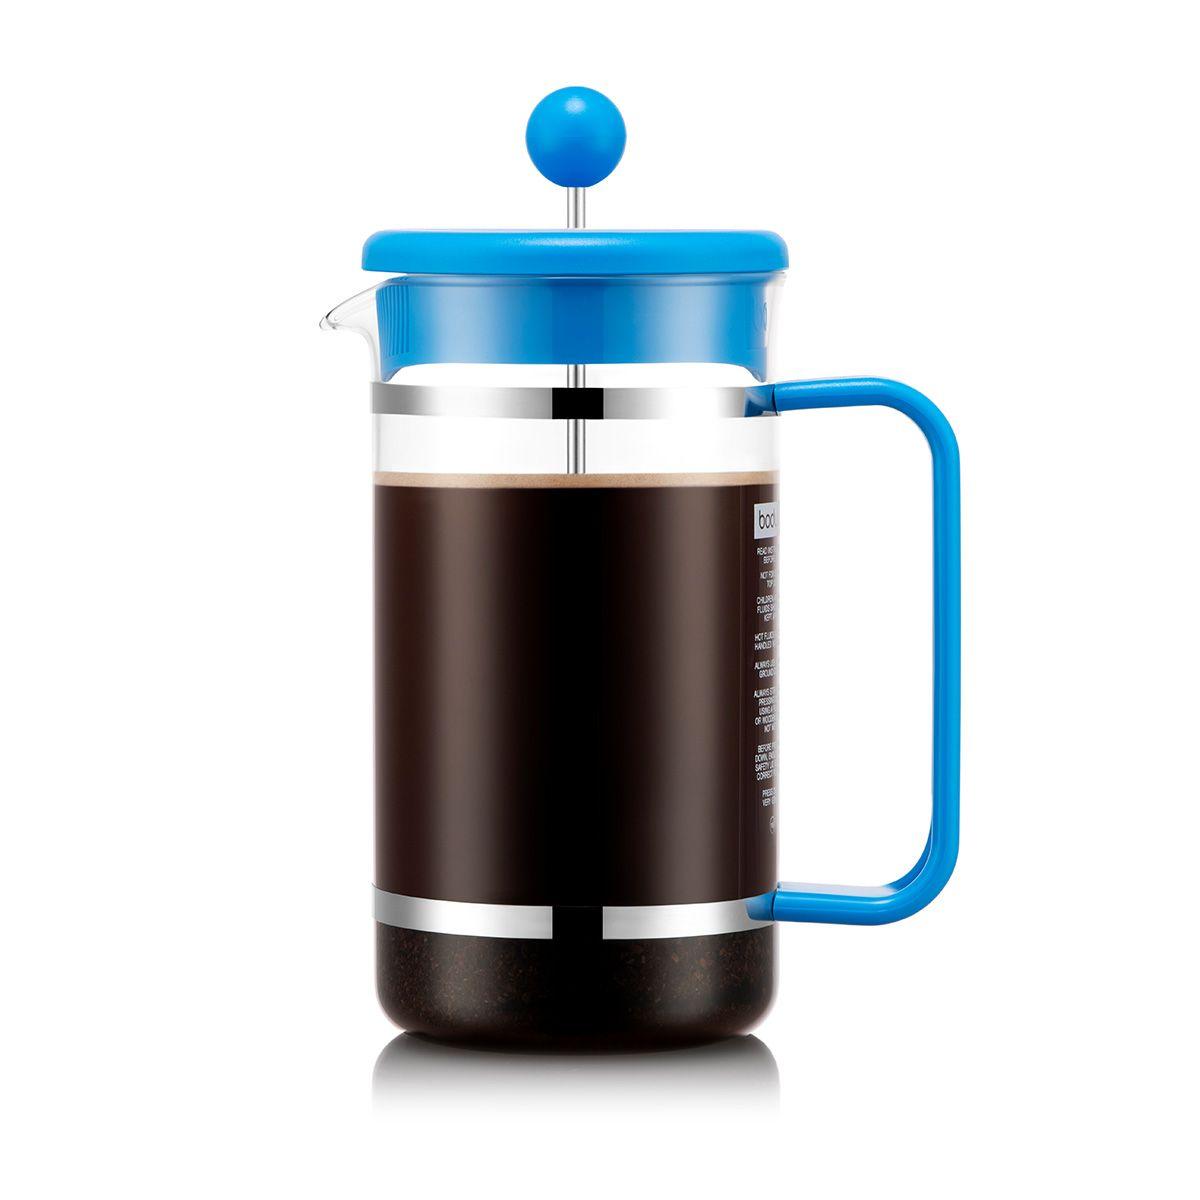 French Press Coffee Maker BISTRO Bodum